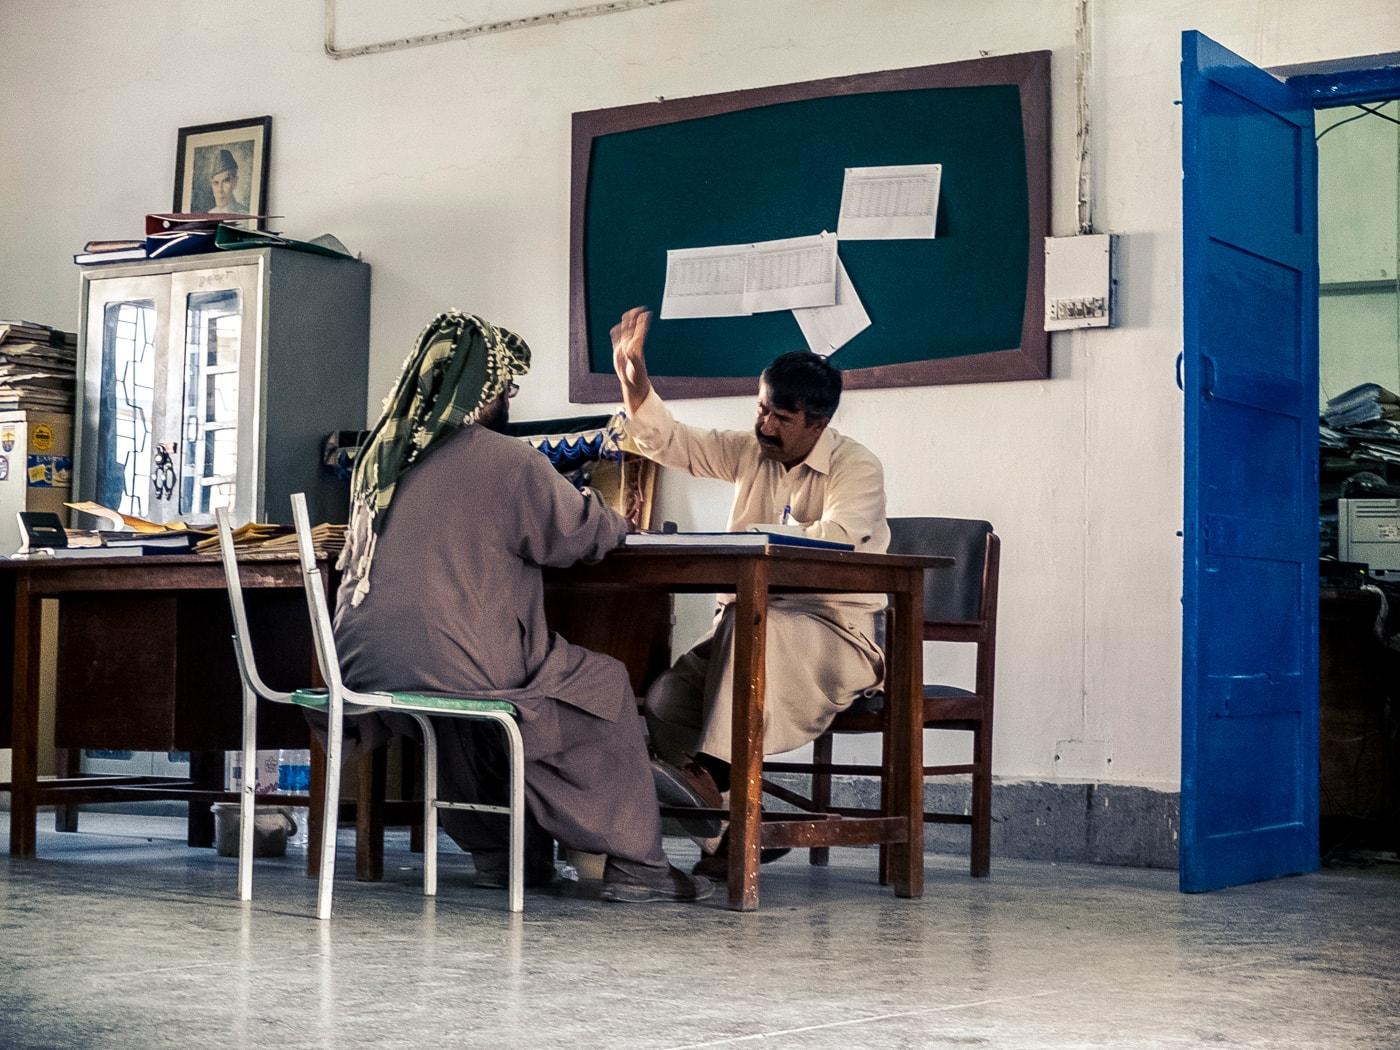 la scorta ufficio dogana pakistan